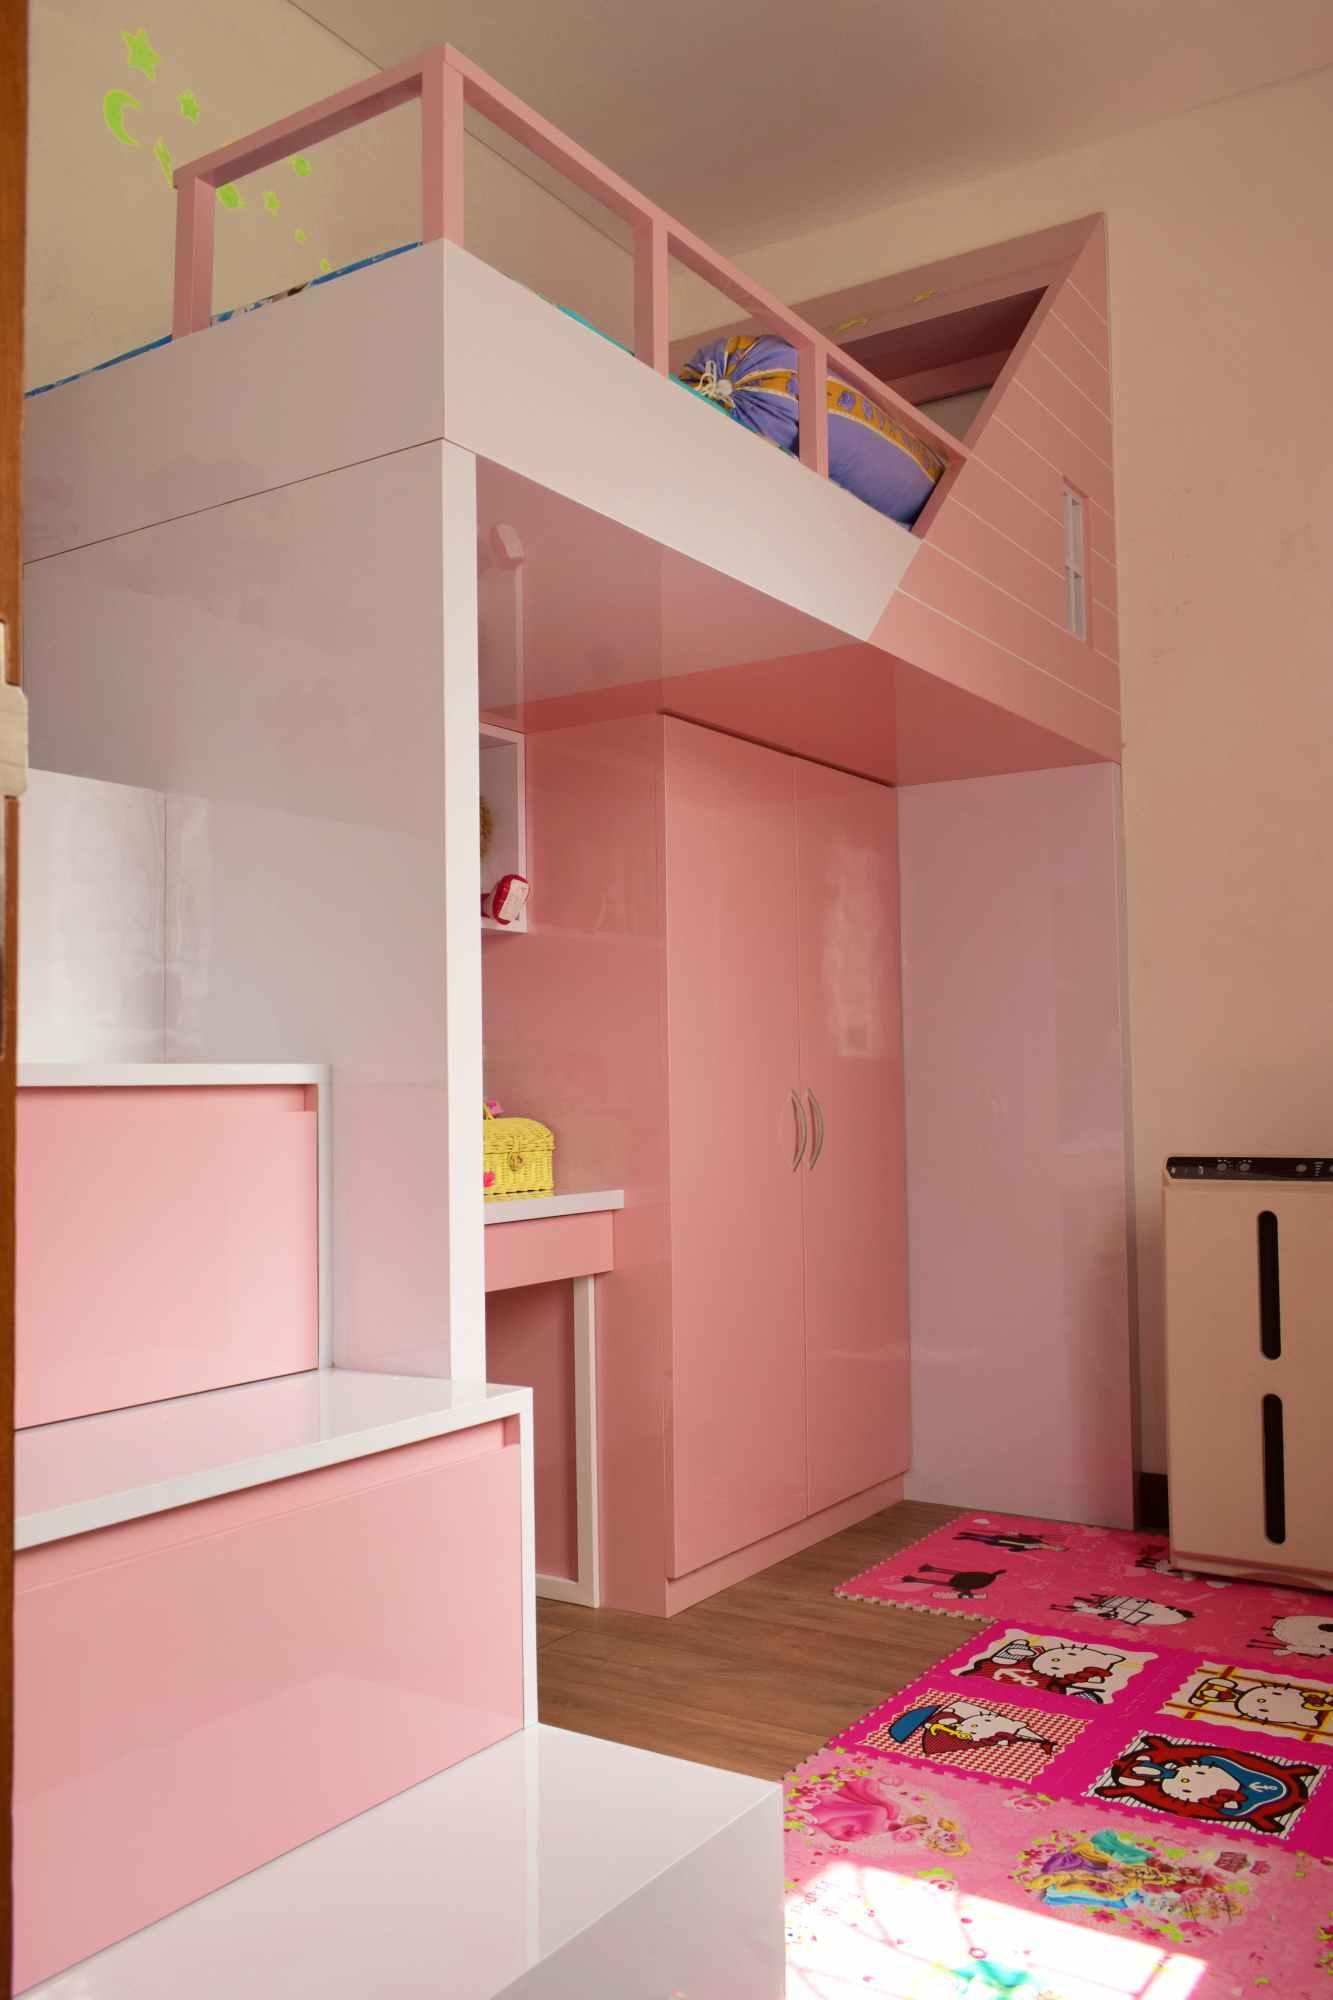 Ide Interior Kamar Anak Perempuan | SARAÈ